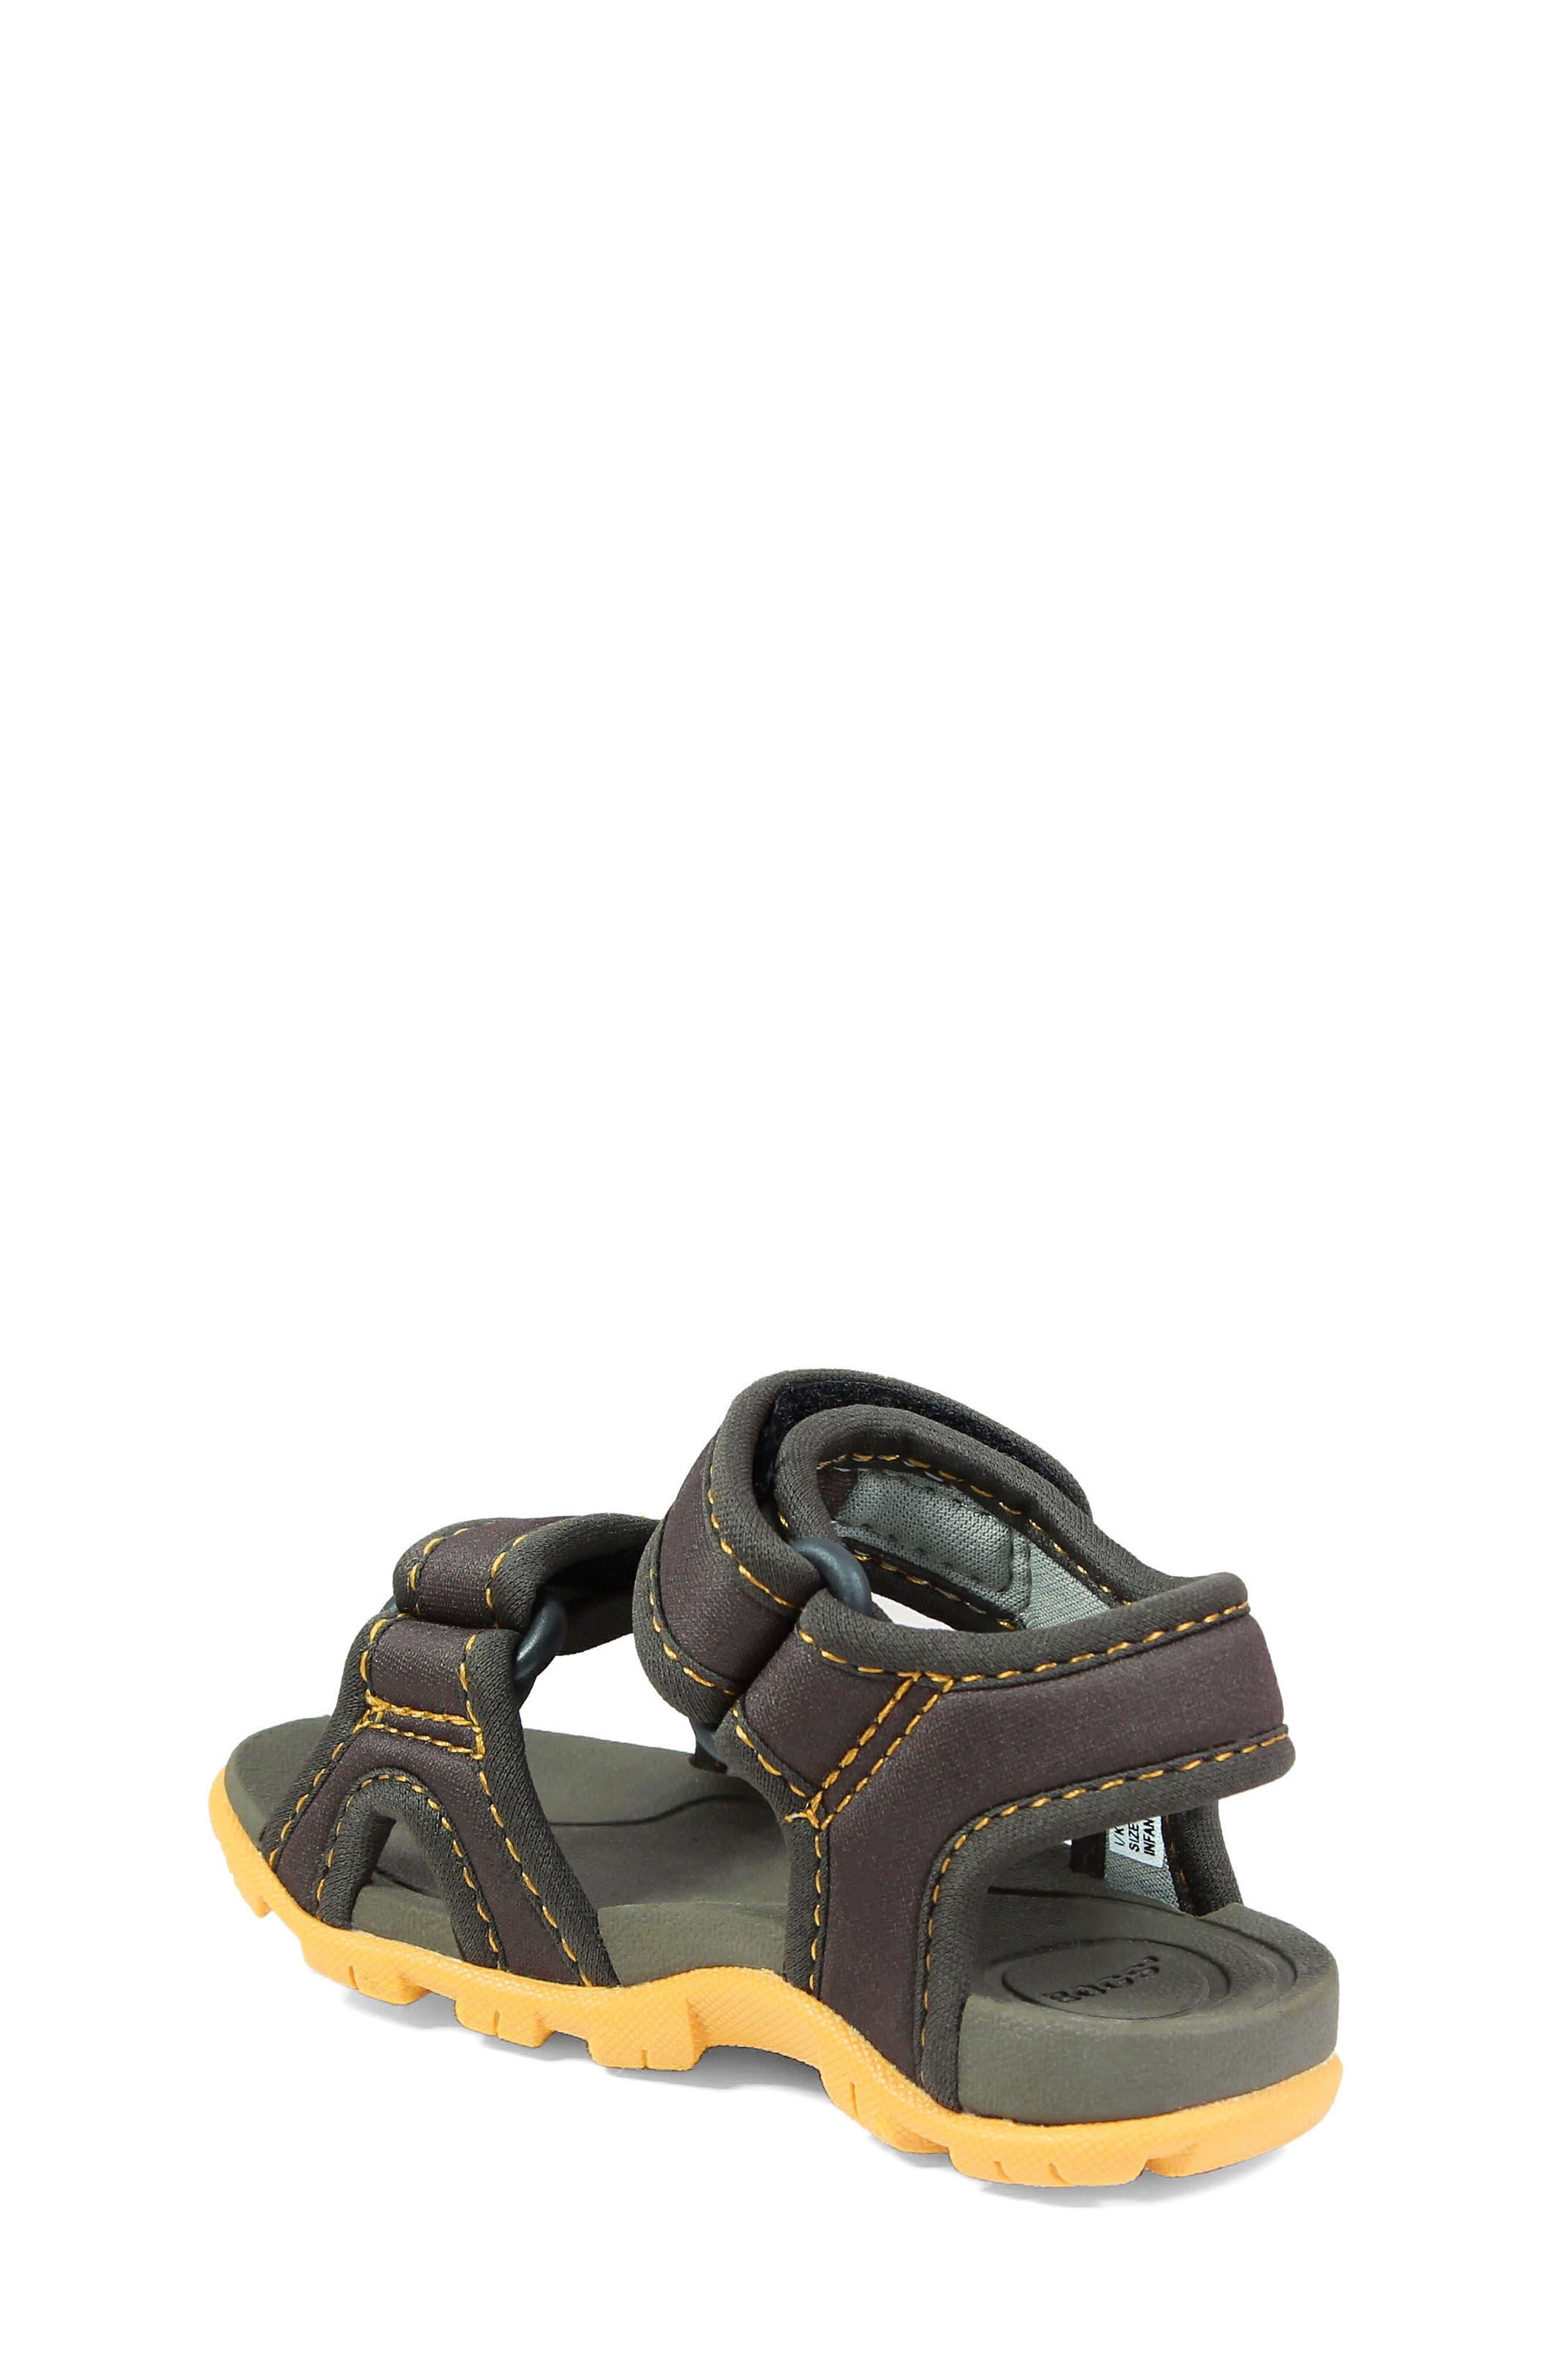 Whitefish Waterproof Sandal,                             Alternate thumbnail 2, color,                             Olive Multi